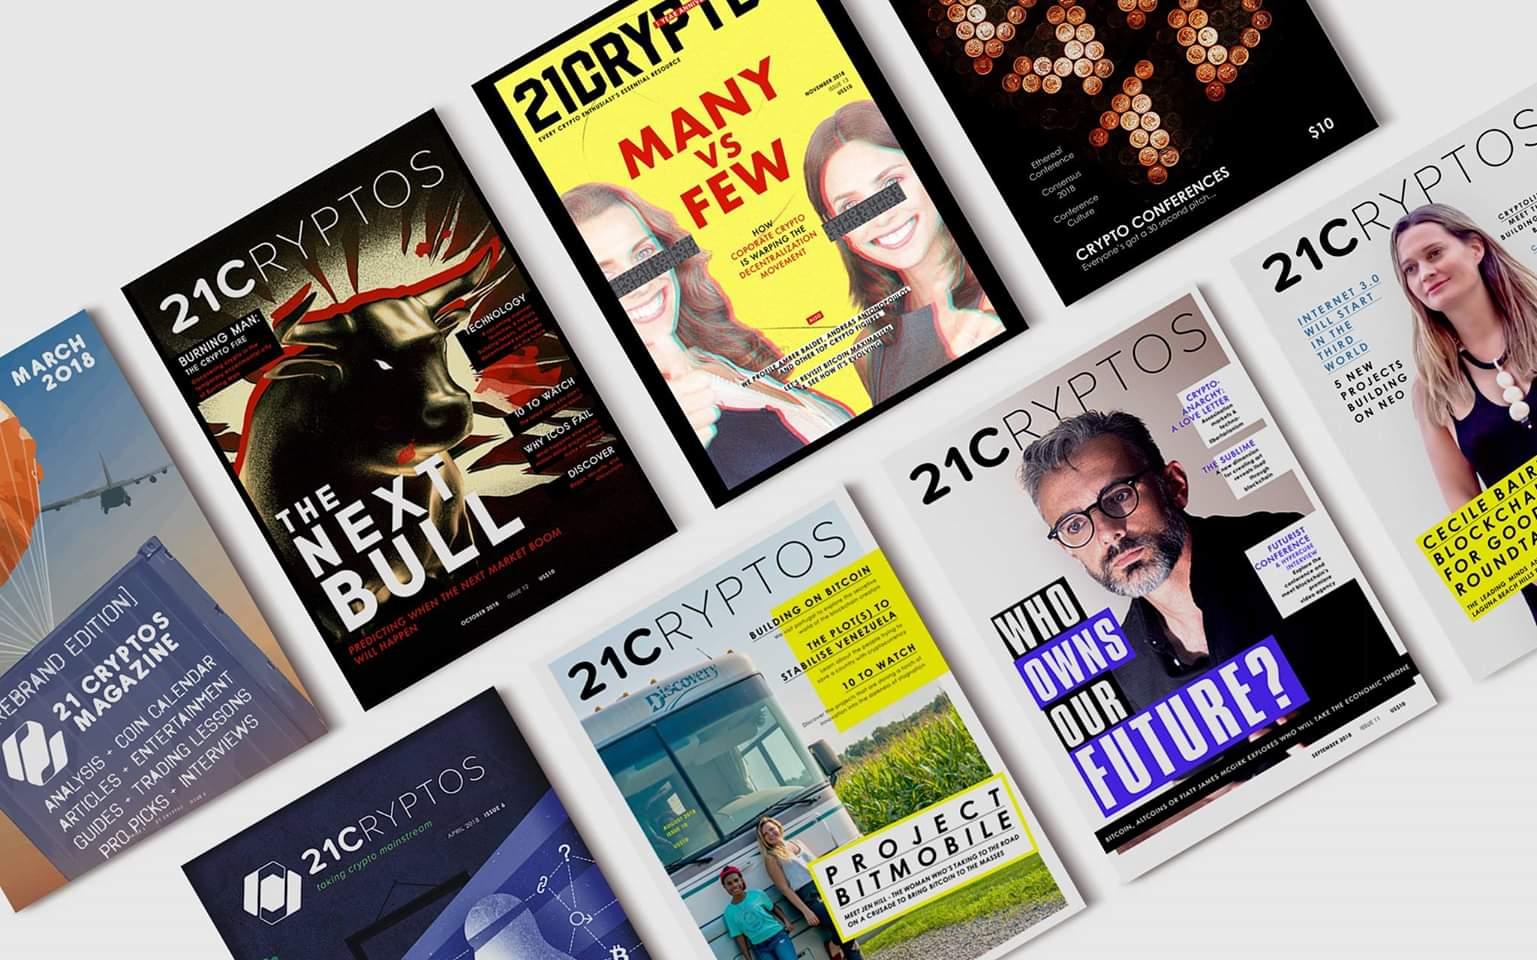 21 cryptos digital magazine